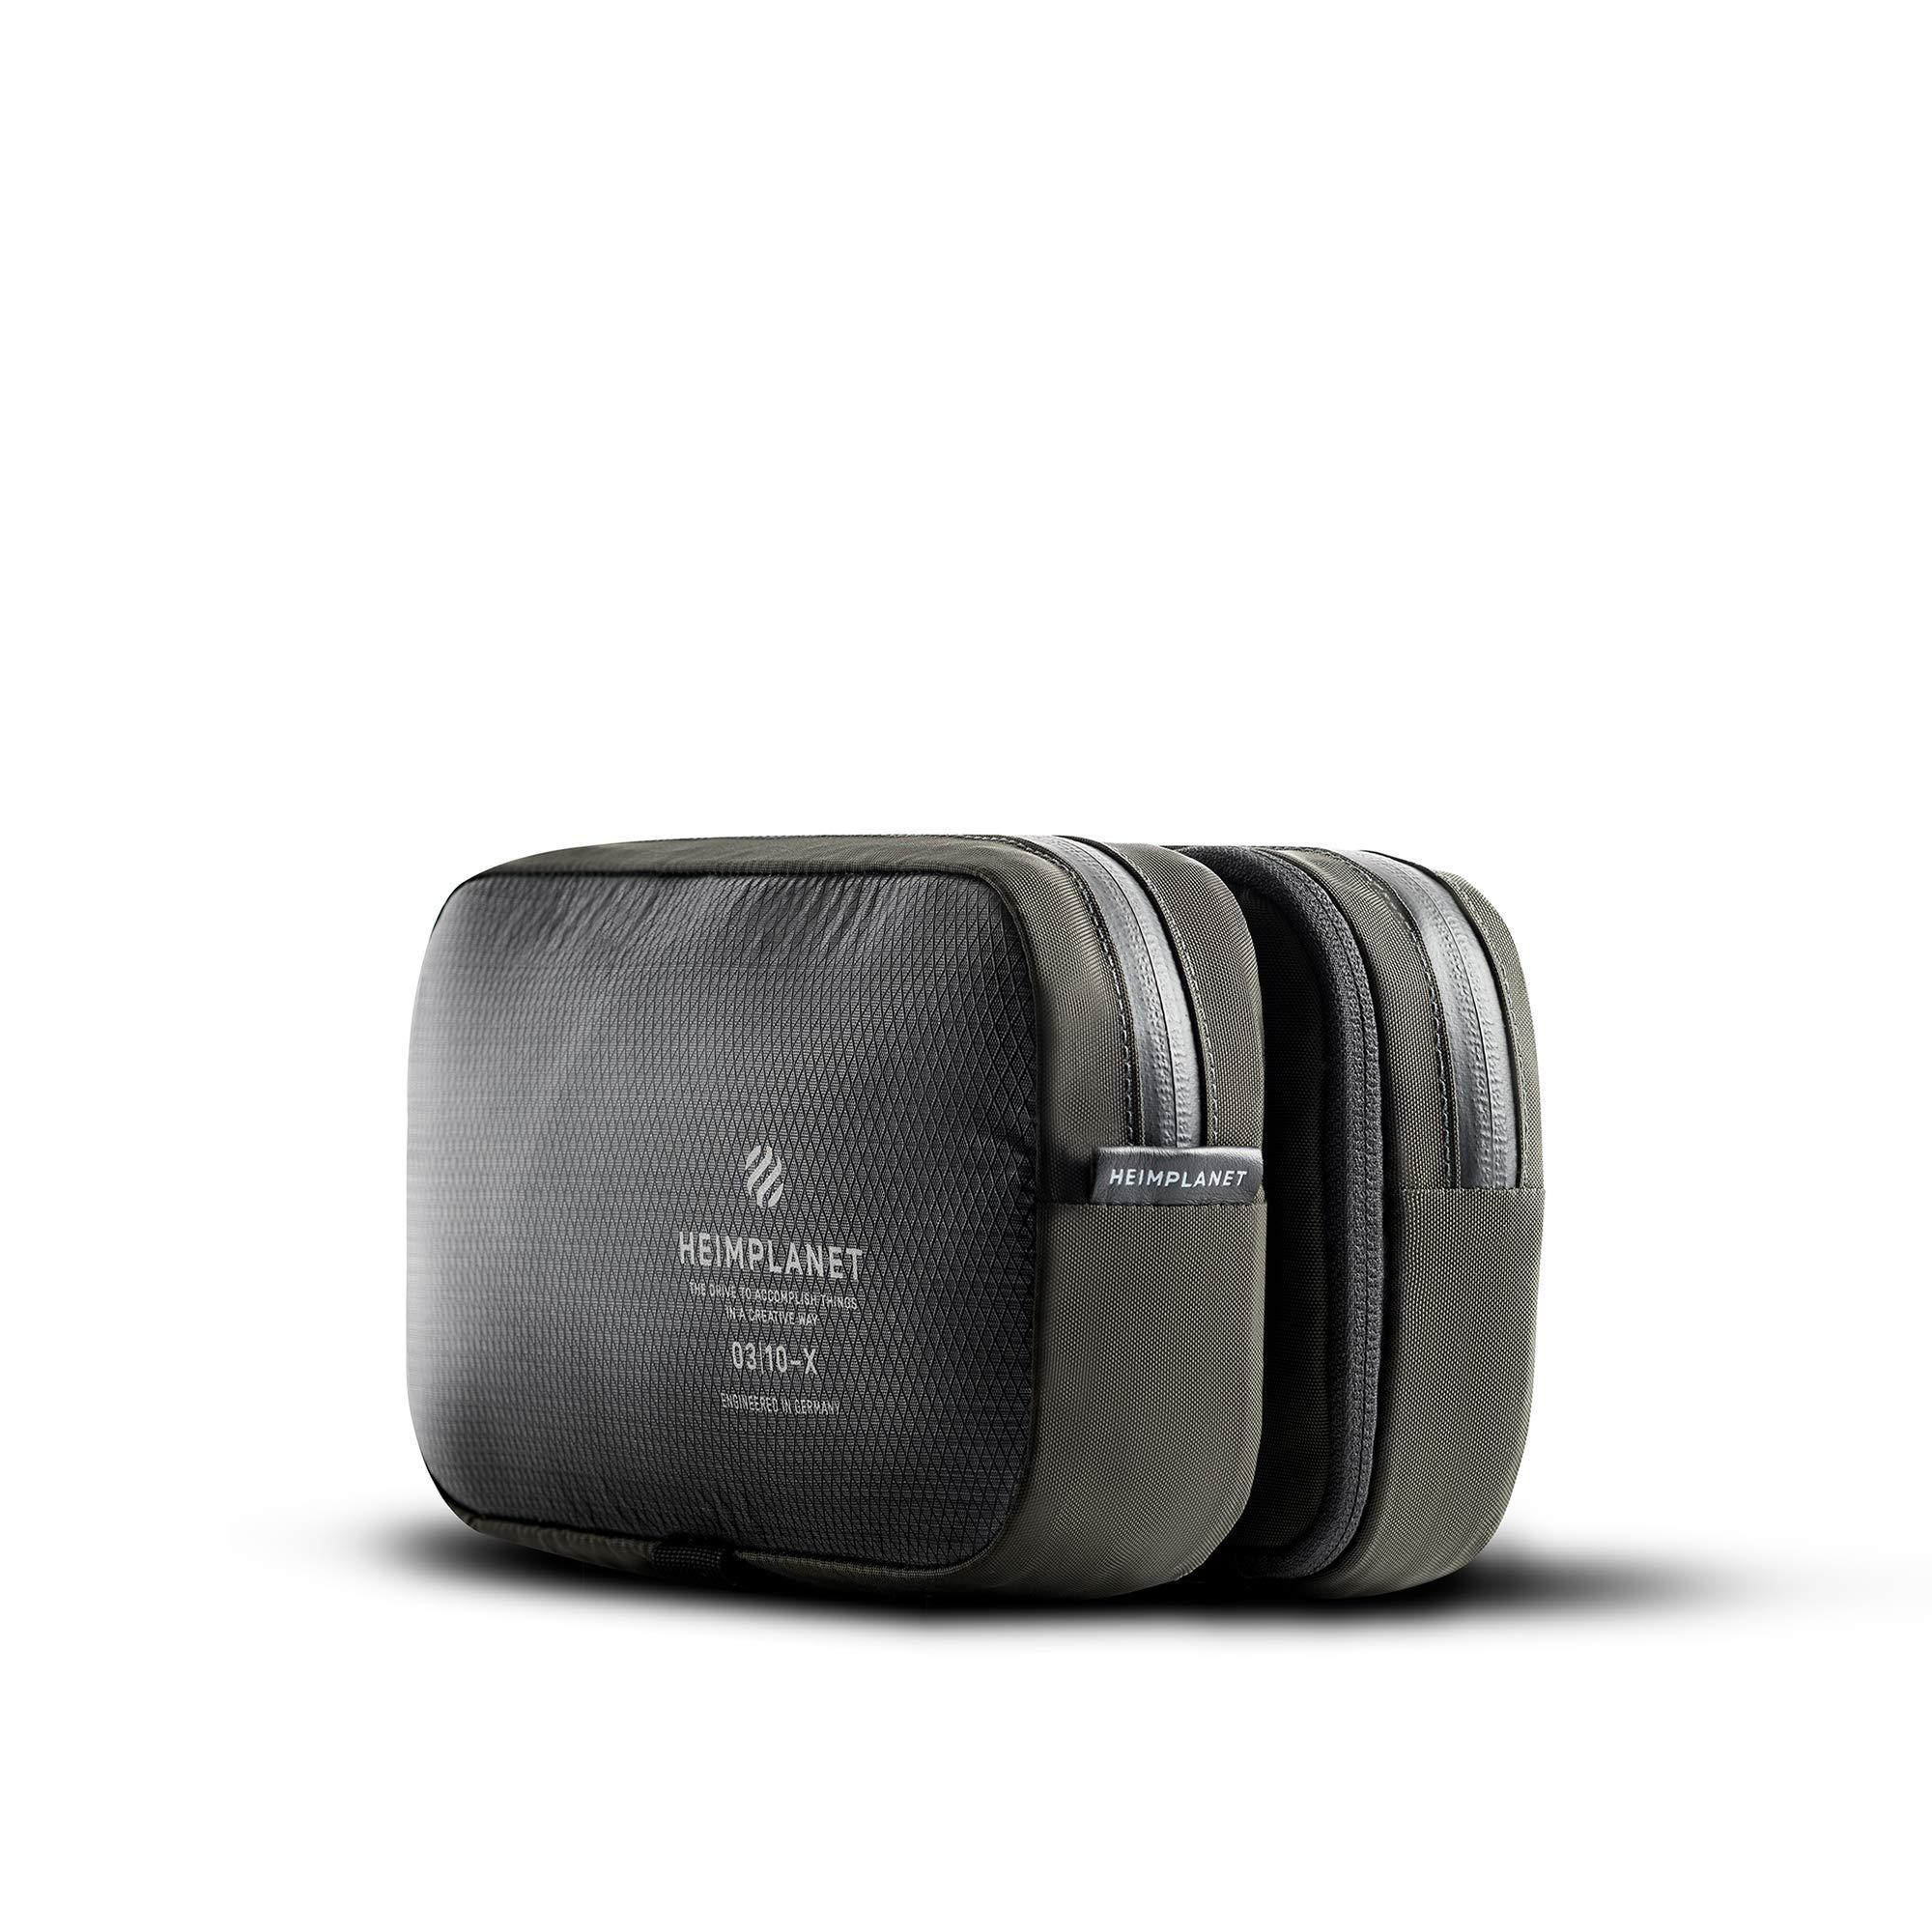 Heimplanet Original | Motion Dopp Kit - Hanging Toiletry Bag | Pvc-Free Travel Wash Bag by HEIMPLANET